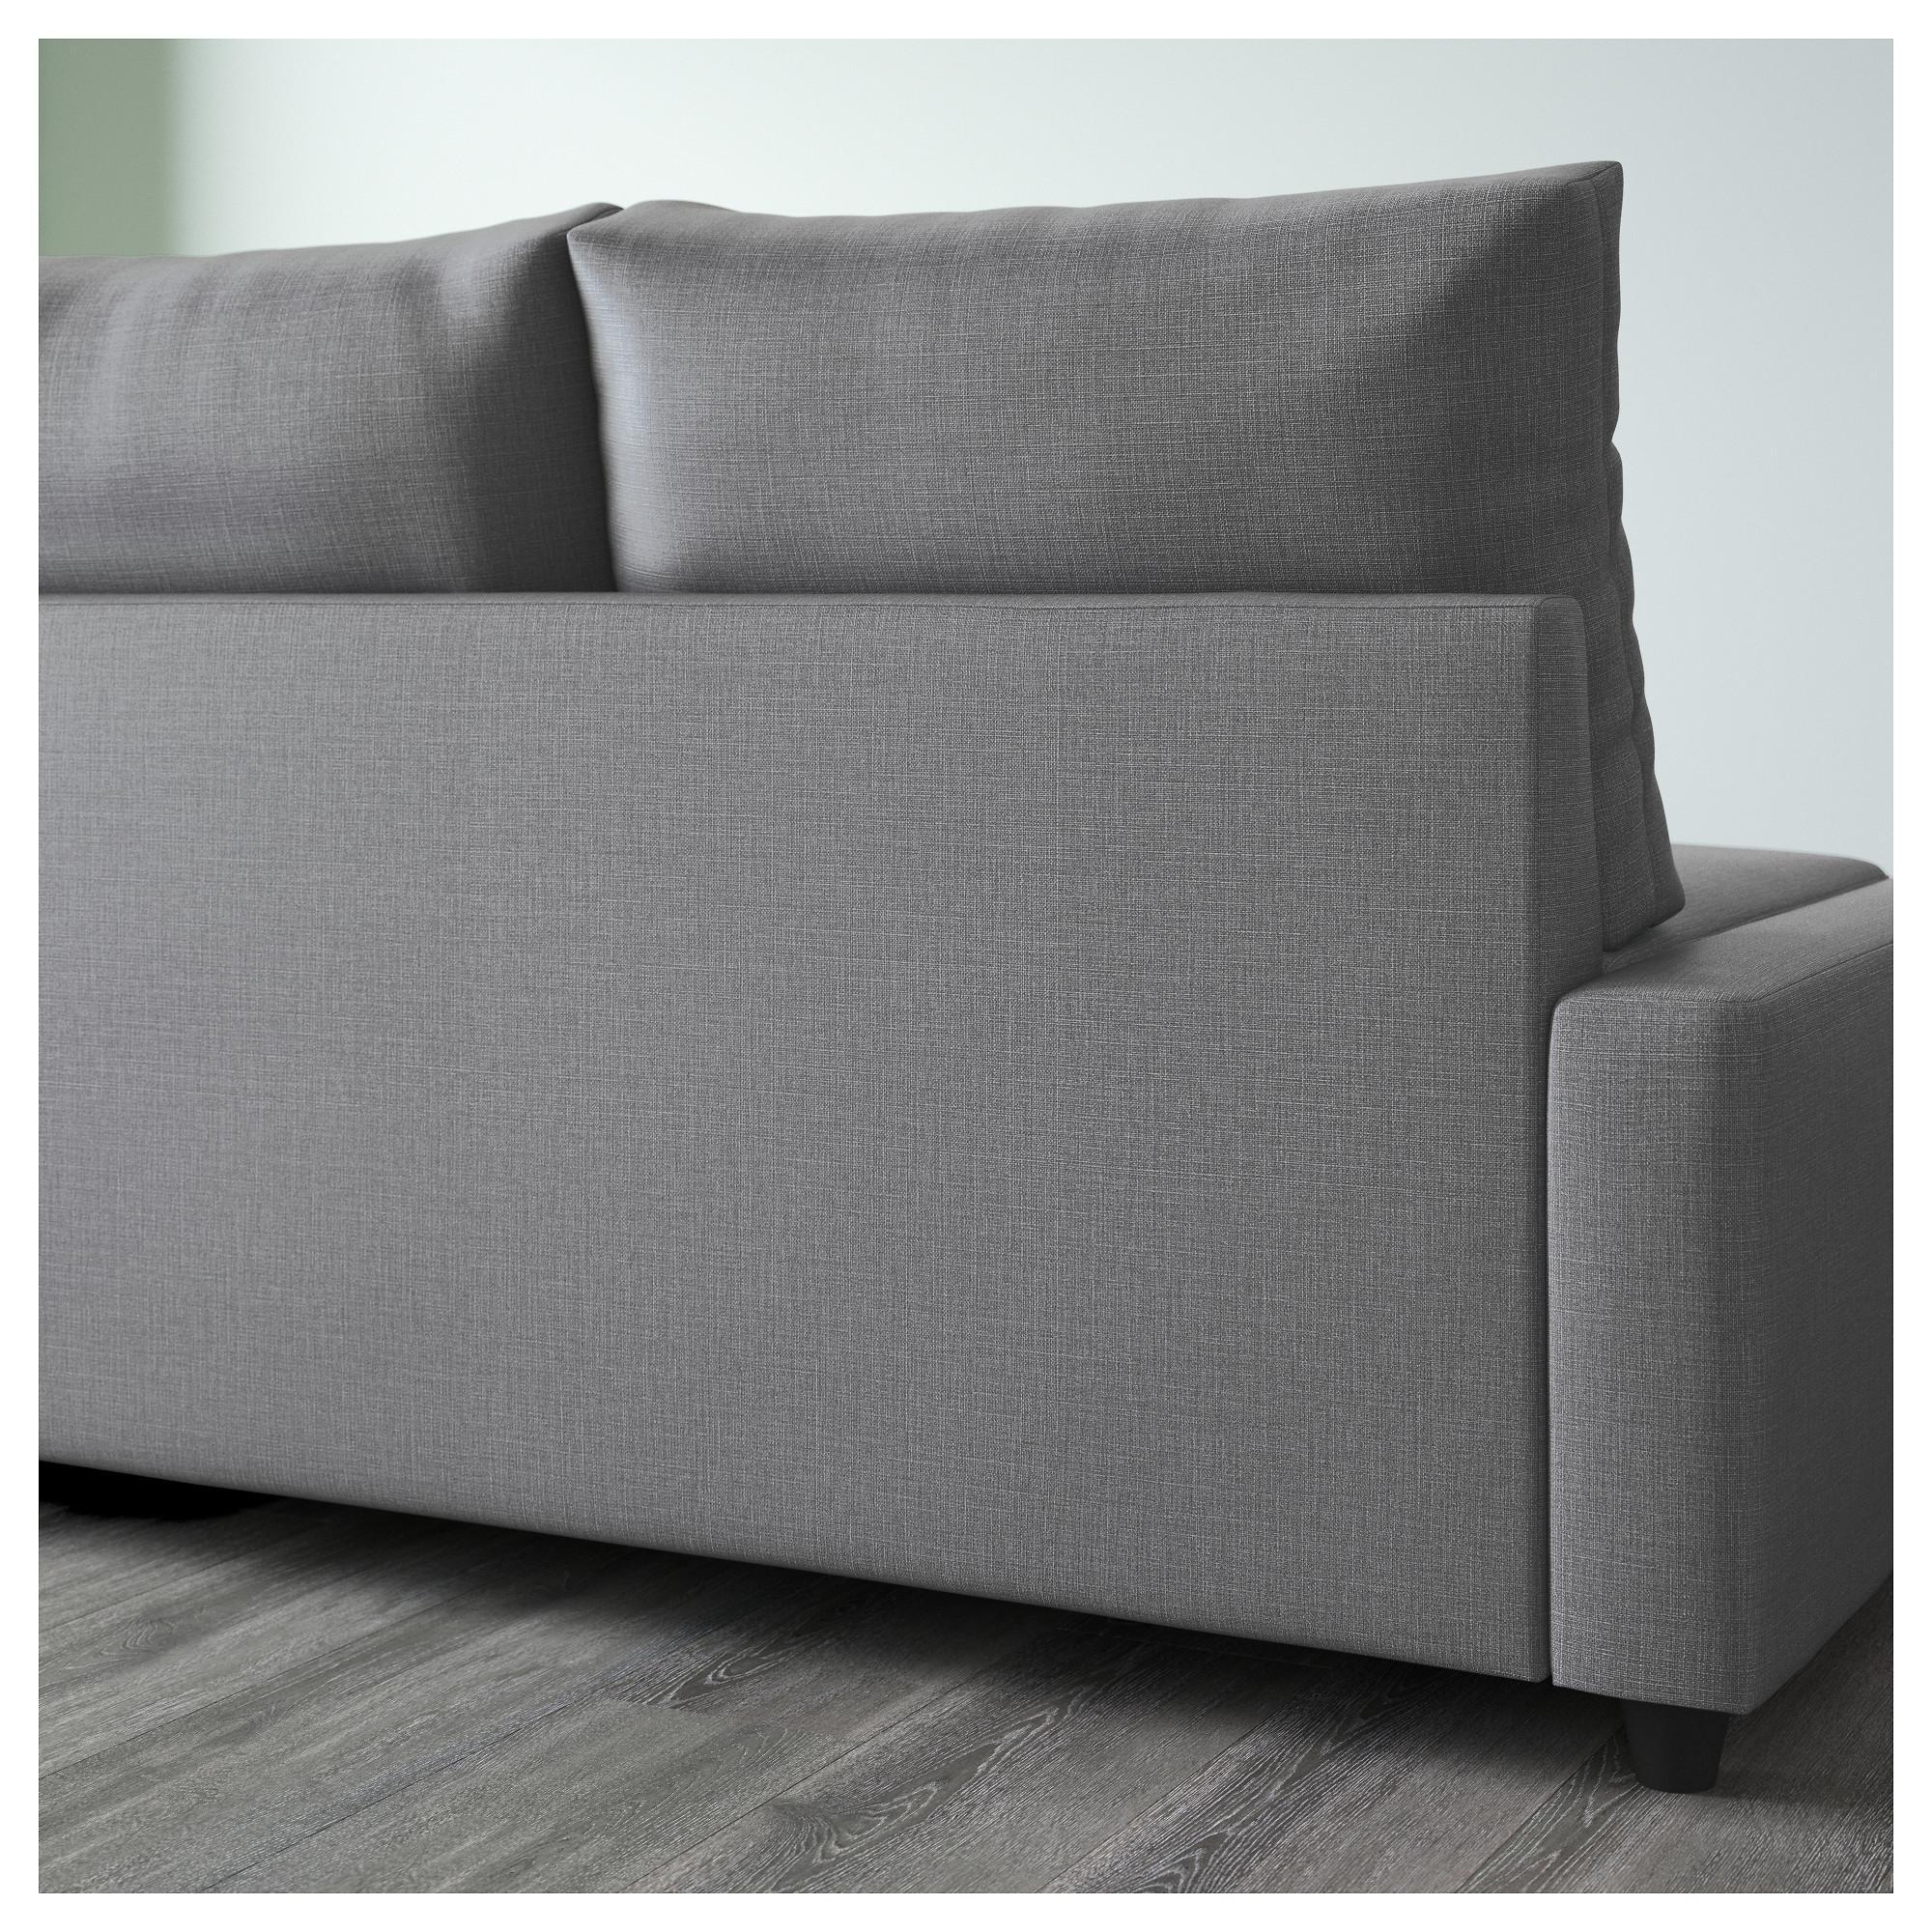 Friheten Corner Sofa Bed With Storage Skiftebo Dark Grey – Ikea Within Ikea Corner Sofa Bed With Storage (Image 11 of 20)